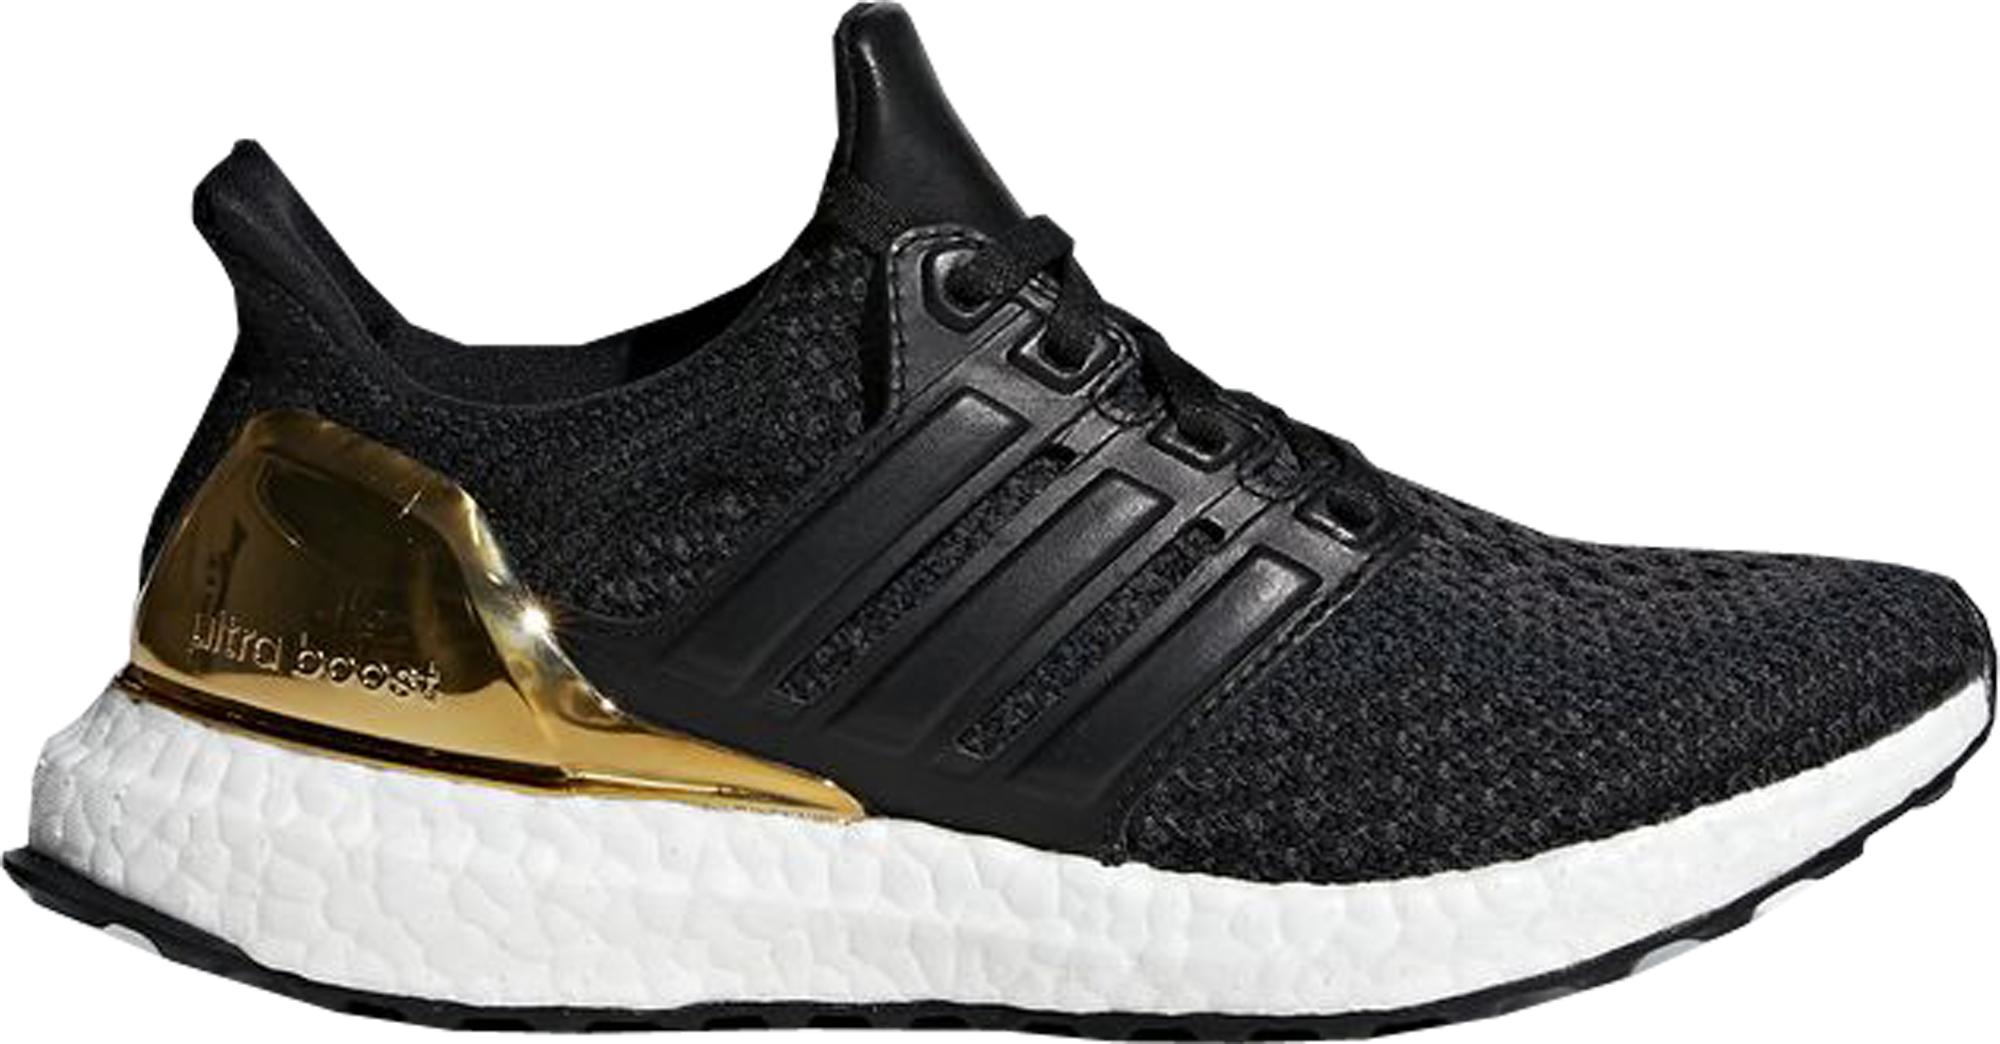 d6109ef5826 ... adidas boost gold medal adidas Ultra ...